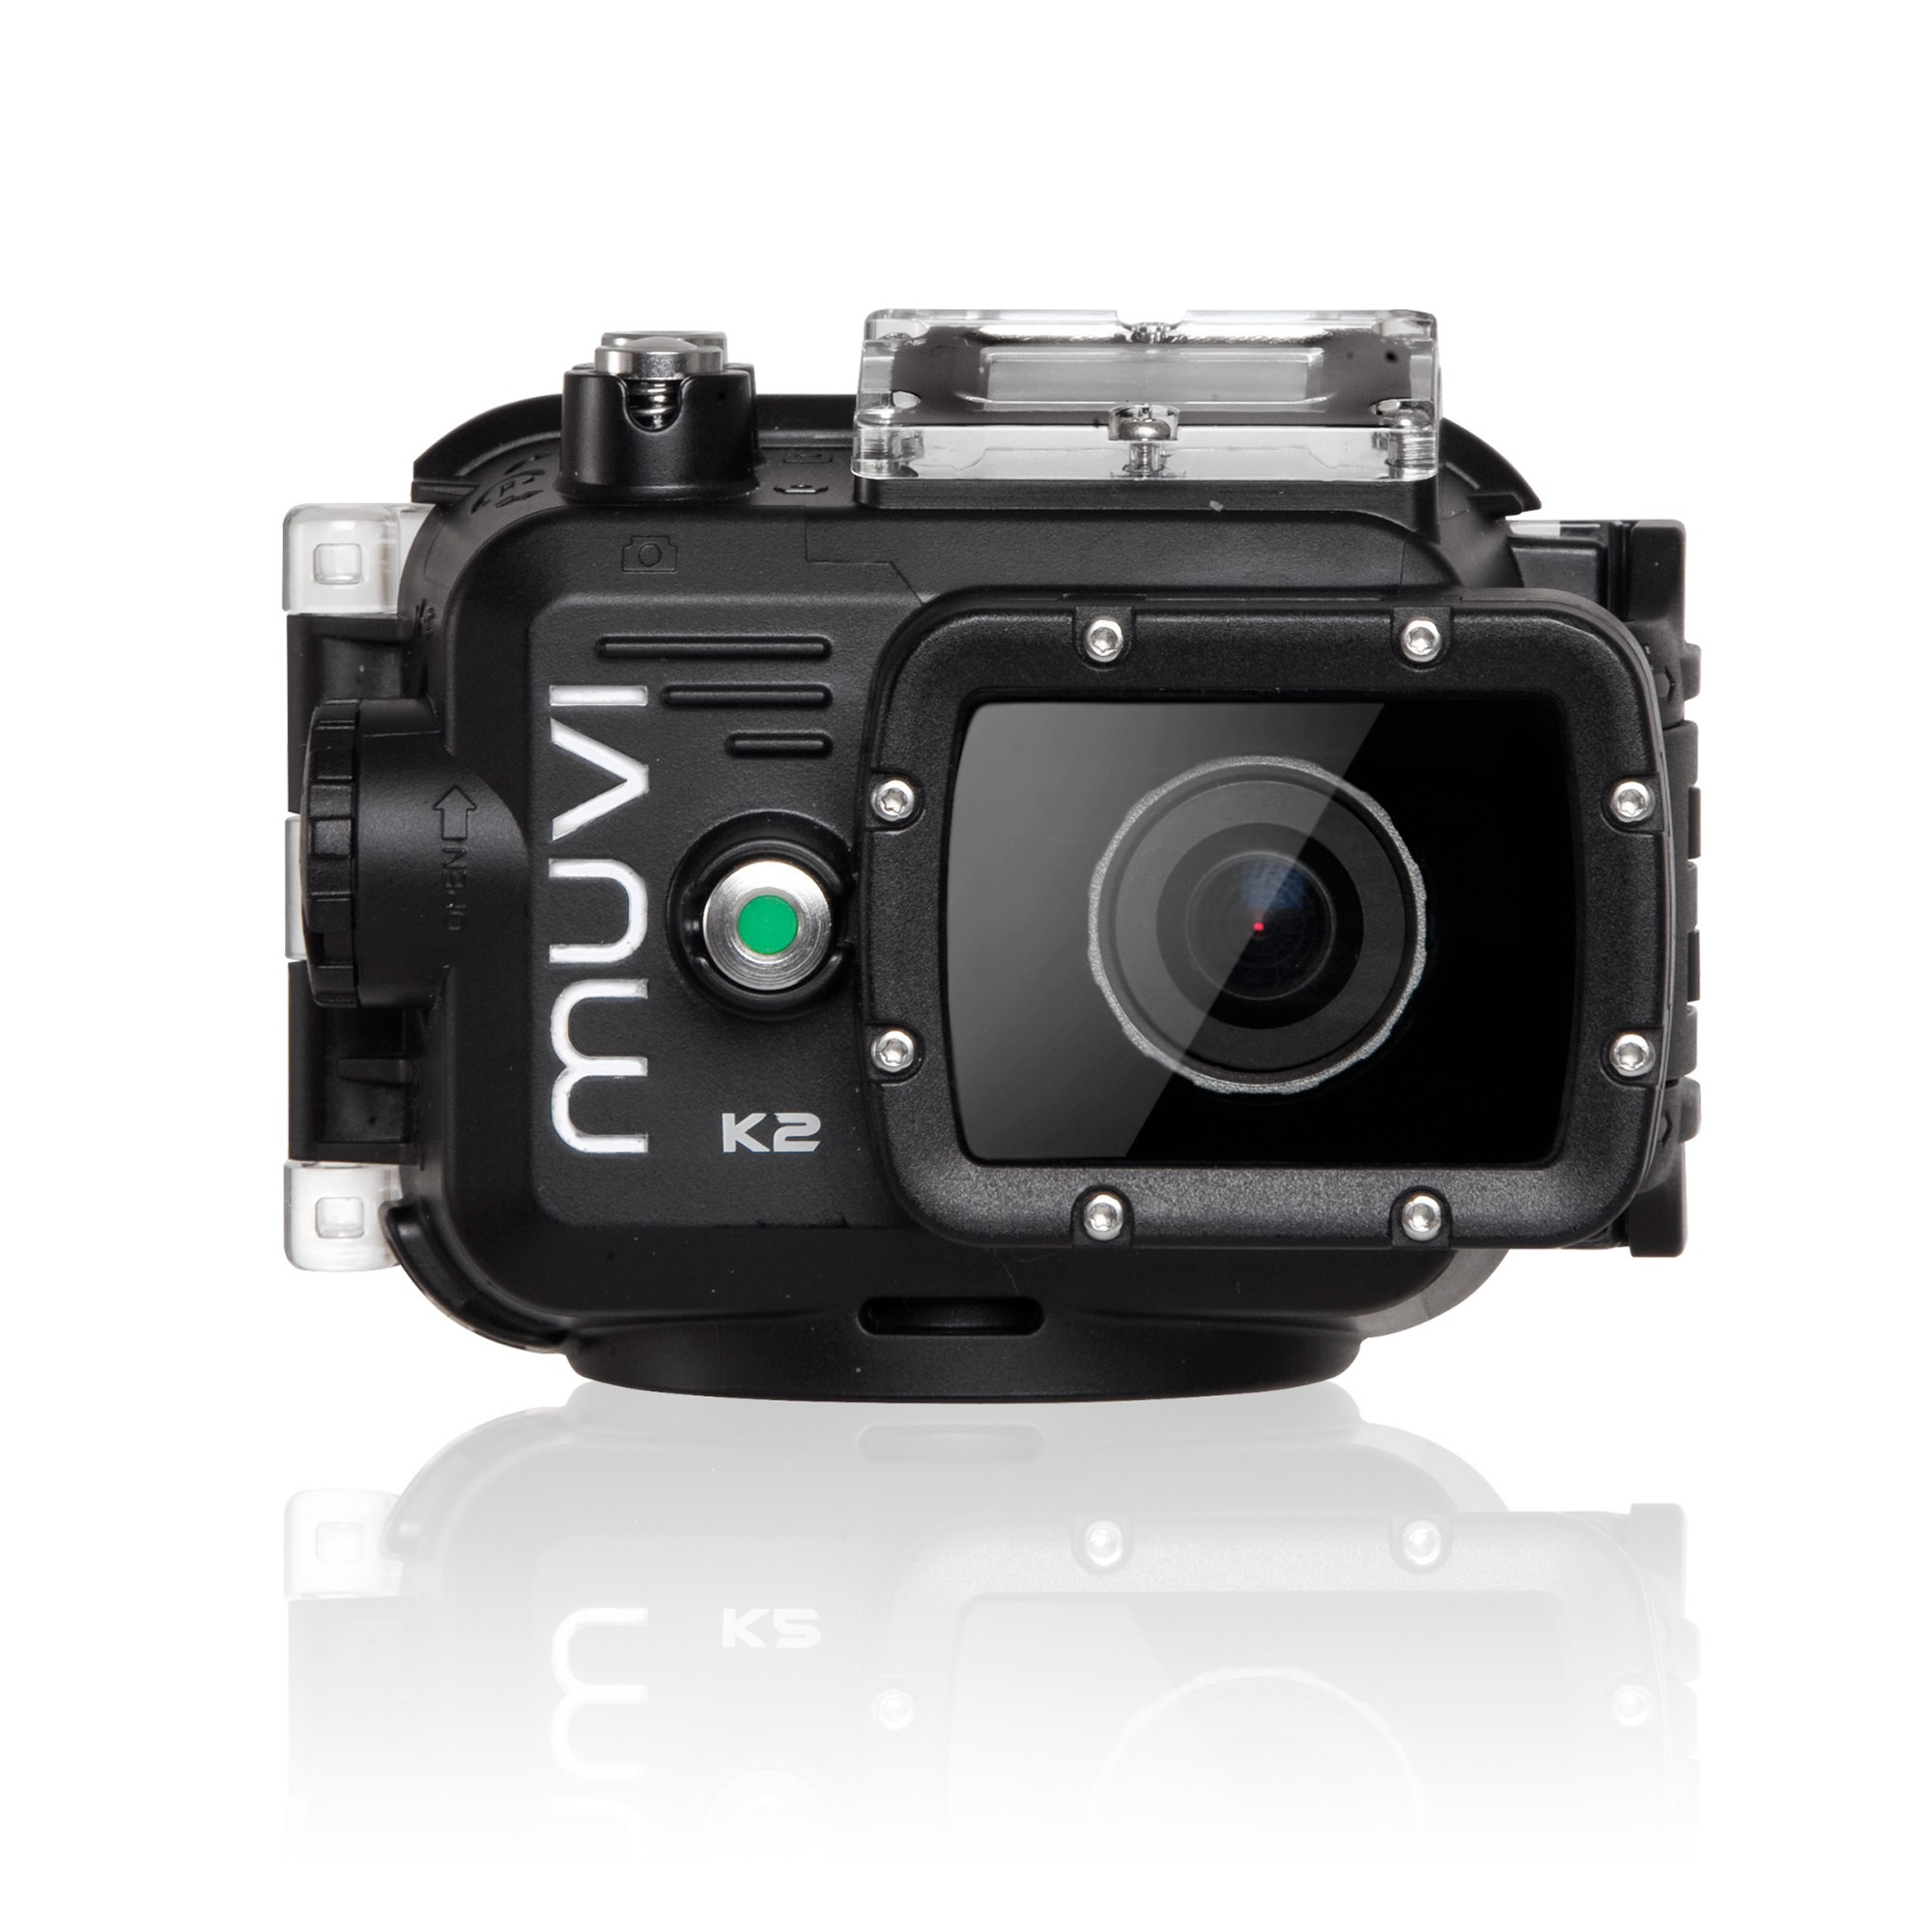 Veho Muvi K-2 16MP Full HD Wi-Fi action sports camera